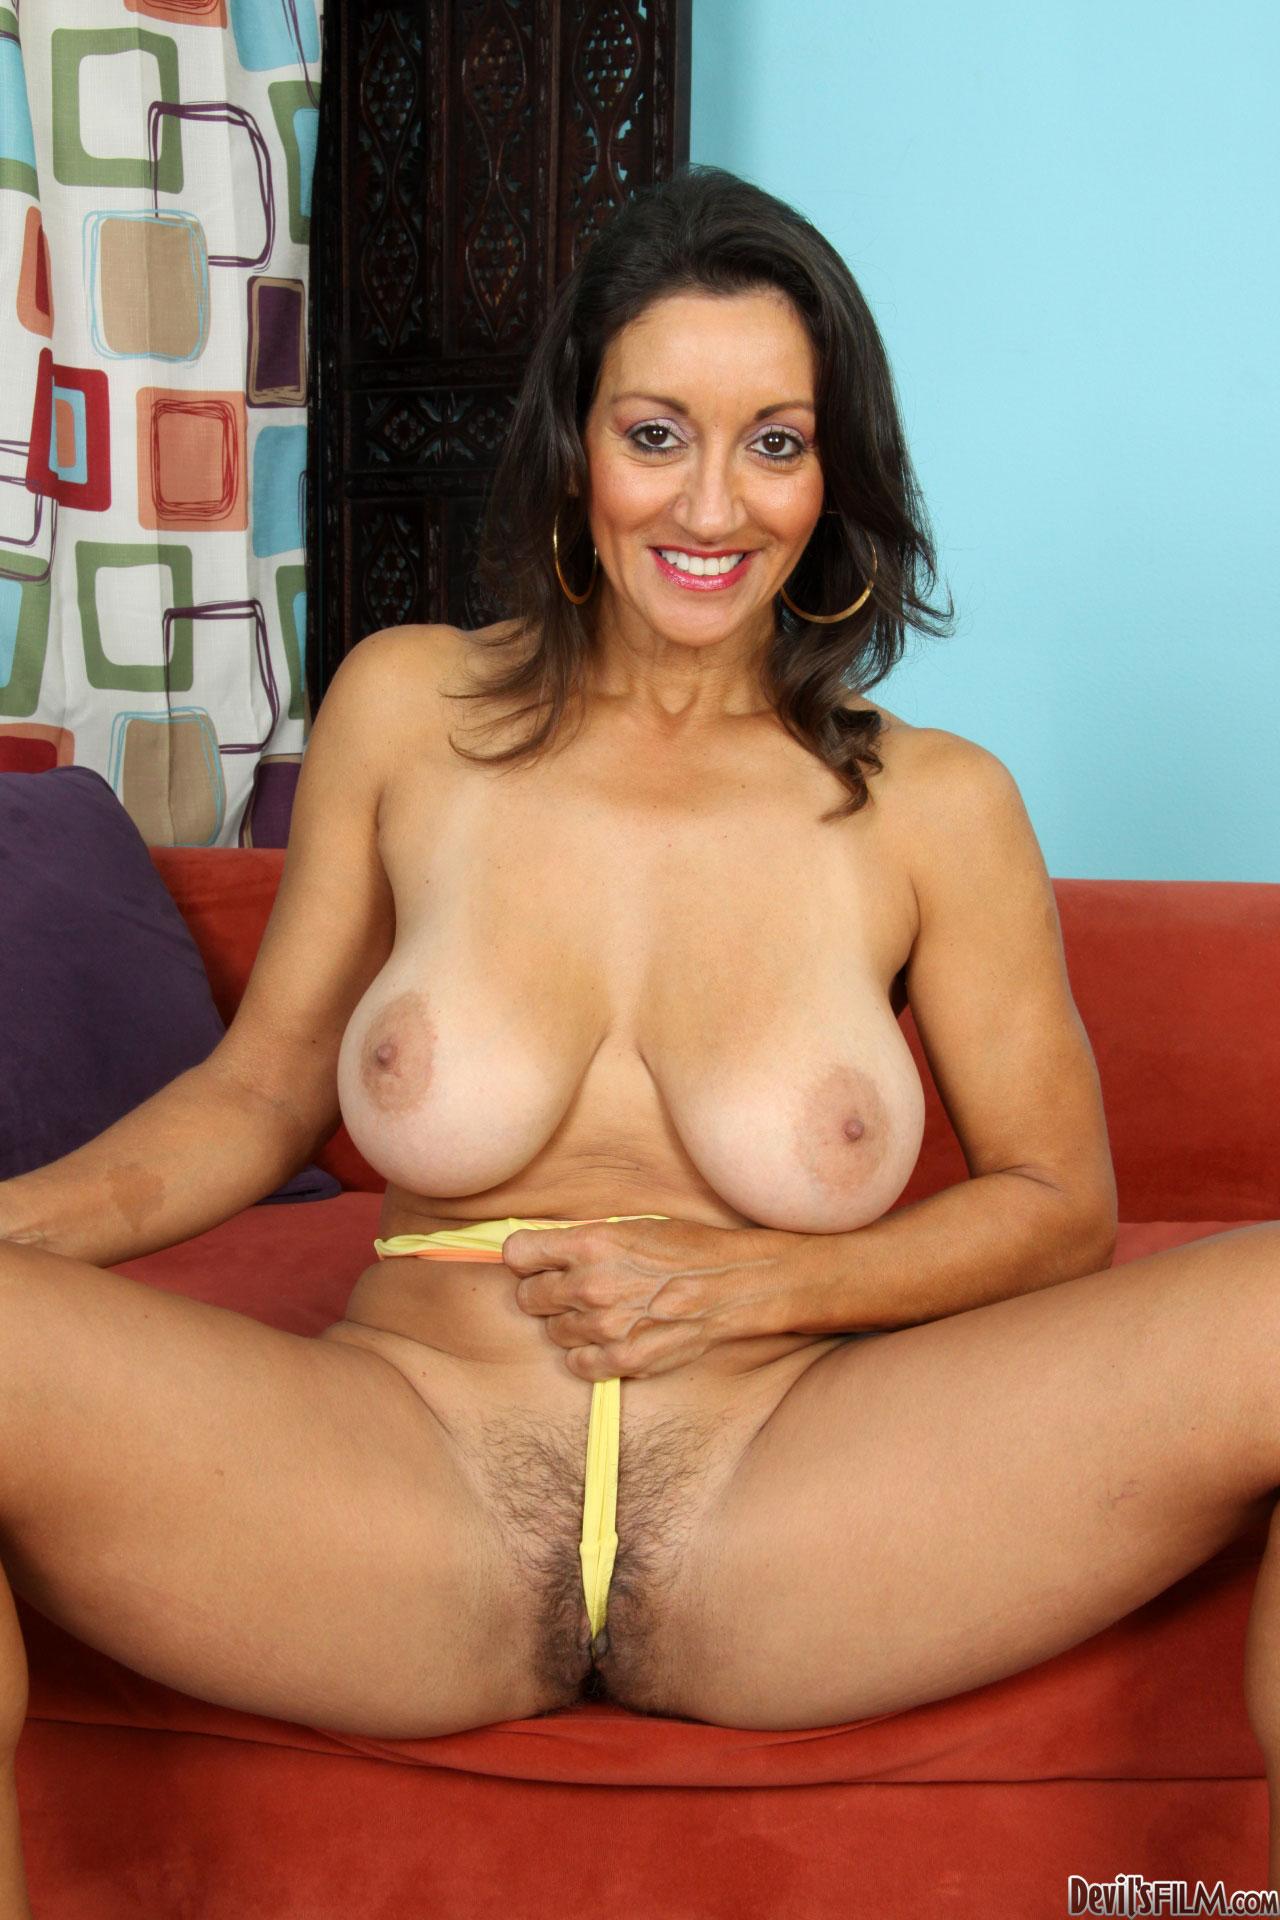 Persia Monir - Your Moms Hairy Pussy 08 70476-1041